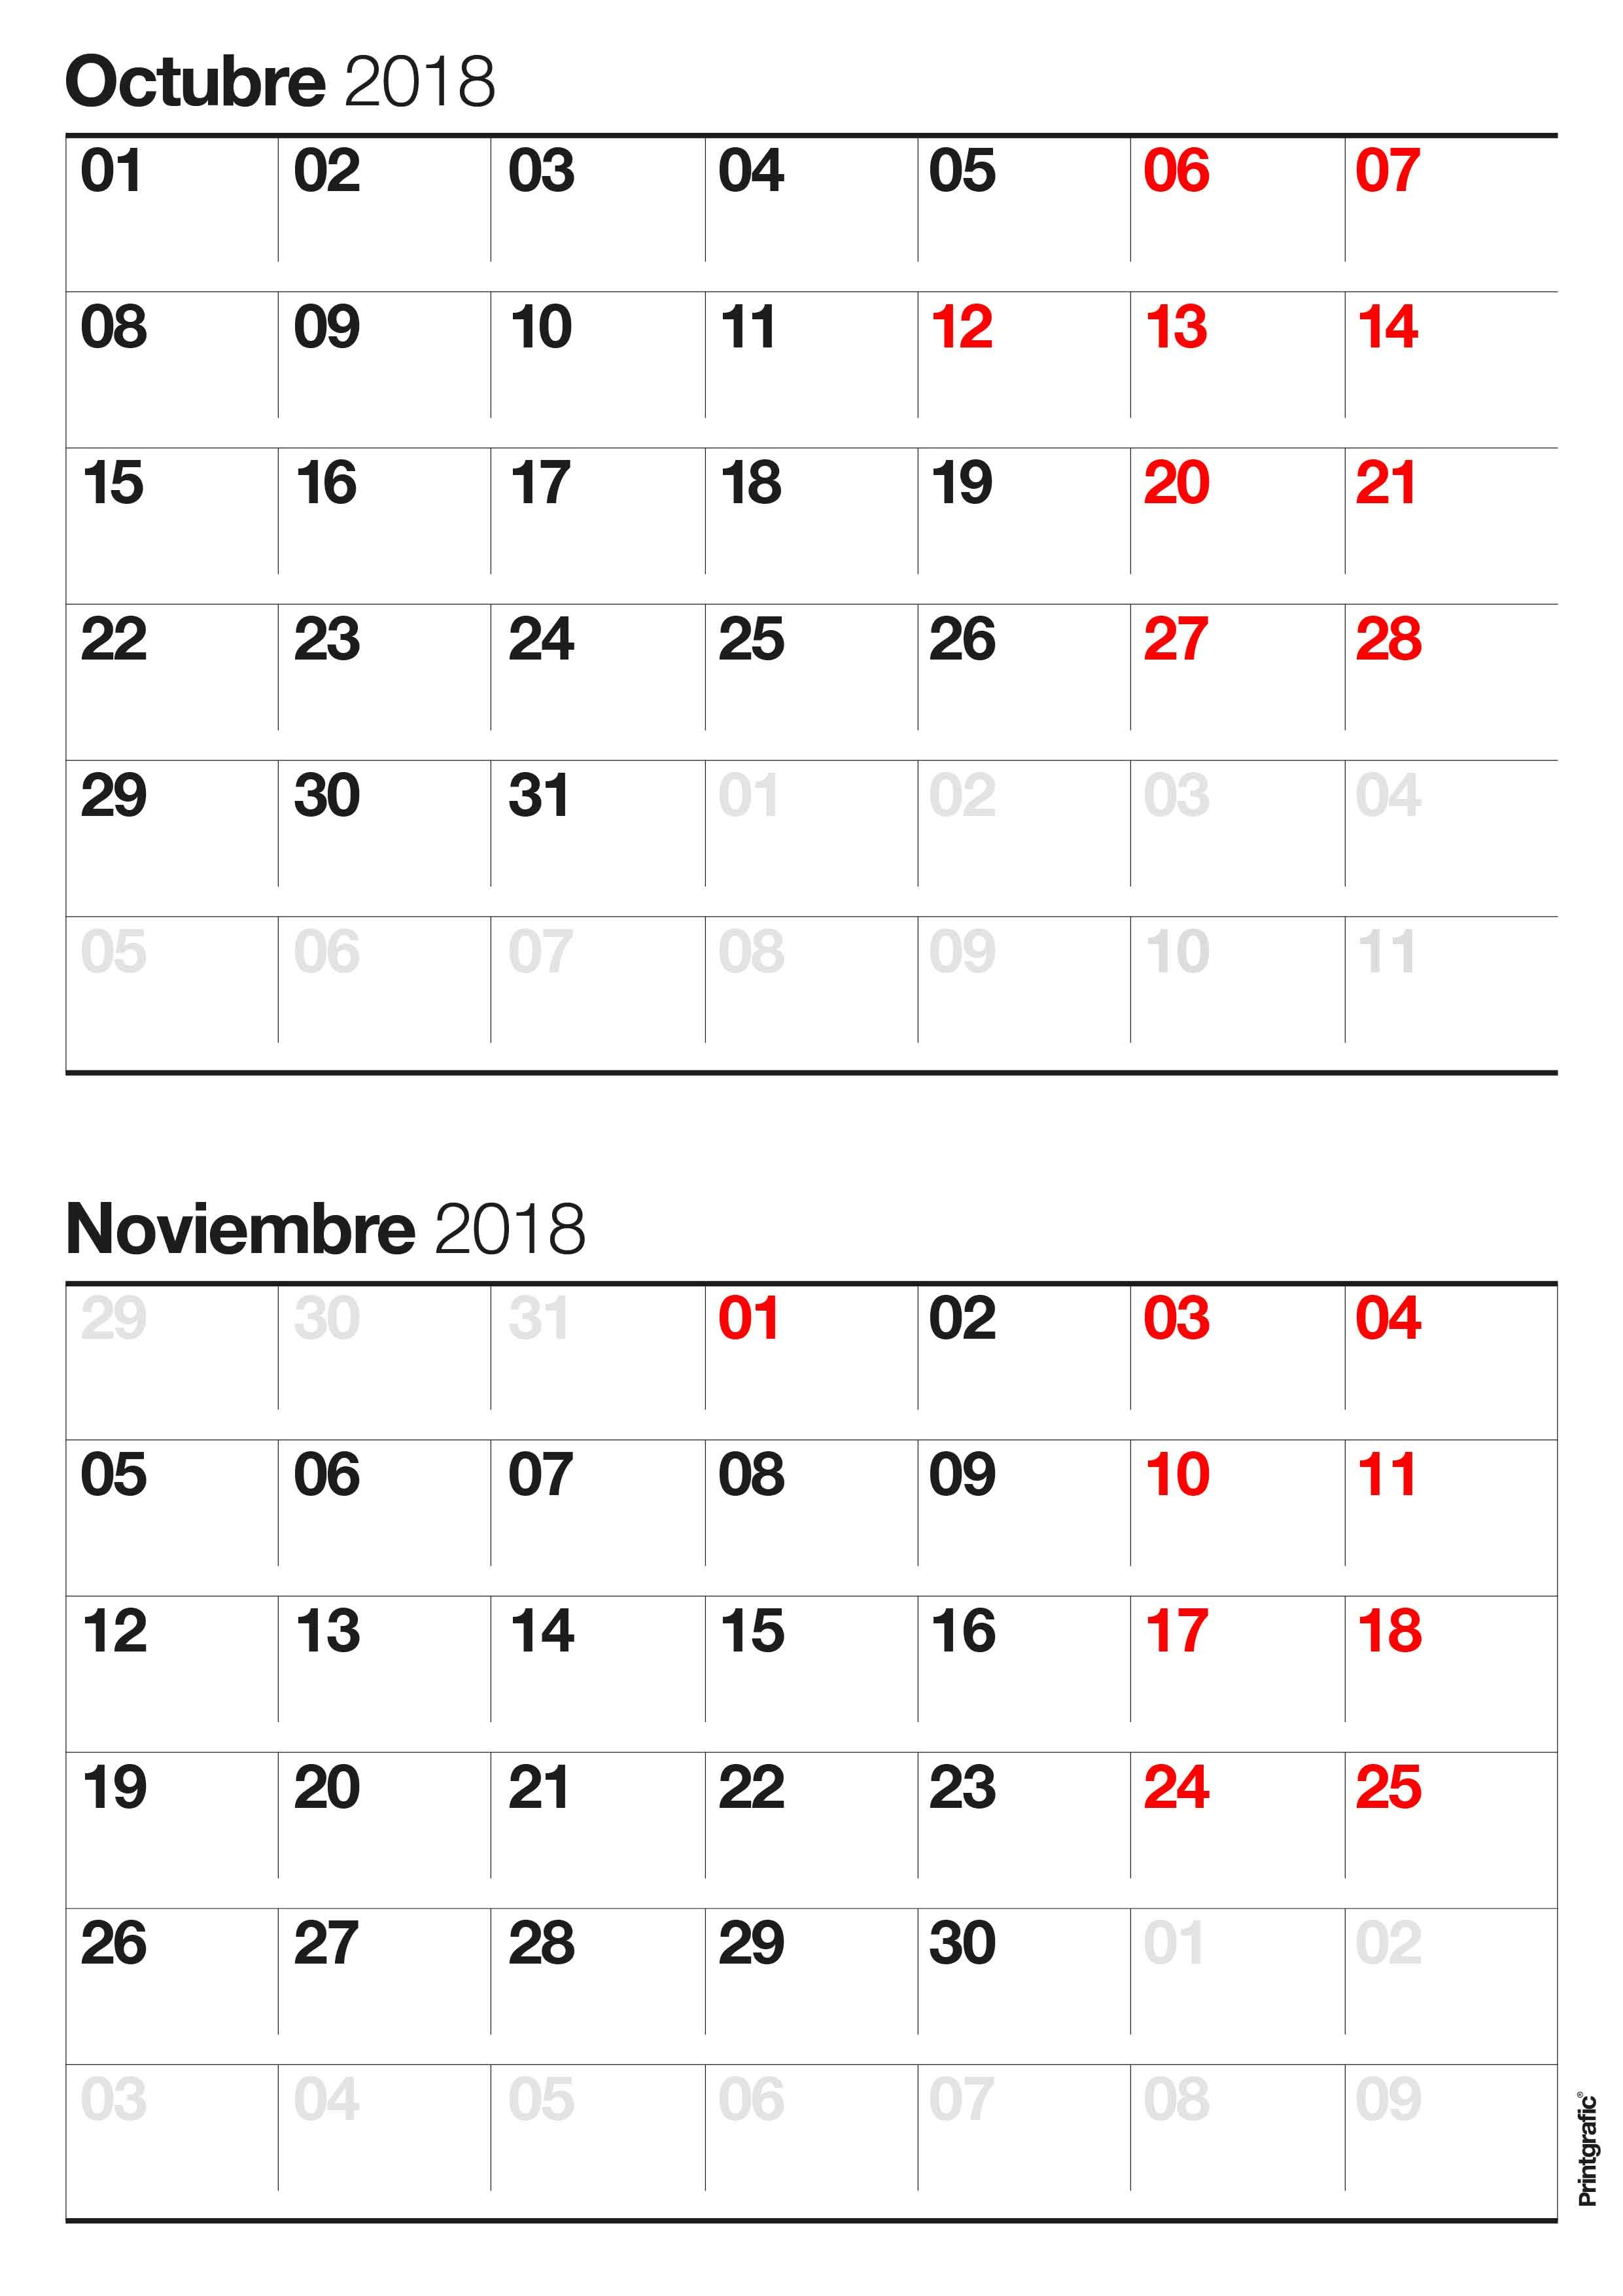 Calendario 2019 Para Imprimir Word Más Arriba-a-fecha Calendario Para Imprimir Of Calendario 2019 Para Imprimir Word Más Actual 2015 2016 2017 Calendar 4 Three Year Printable Pdf Calendars